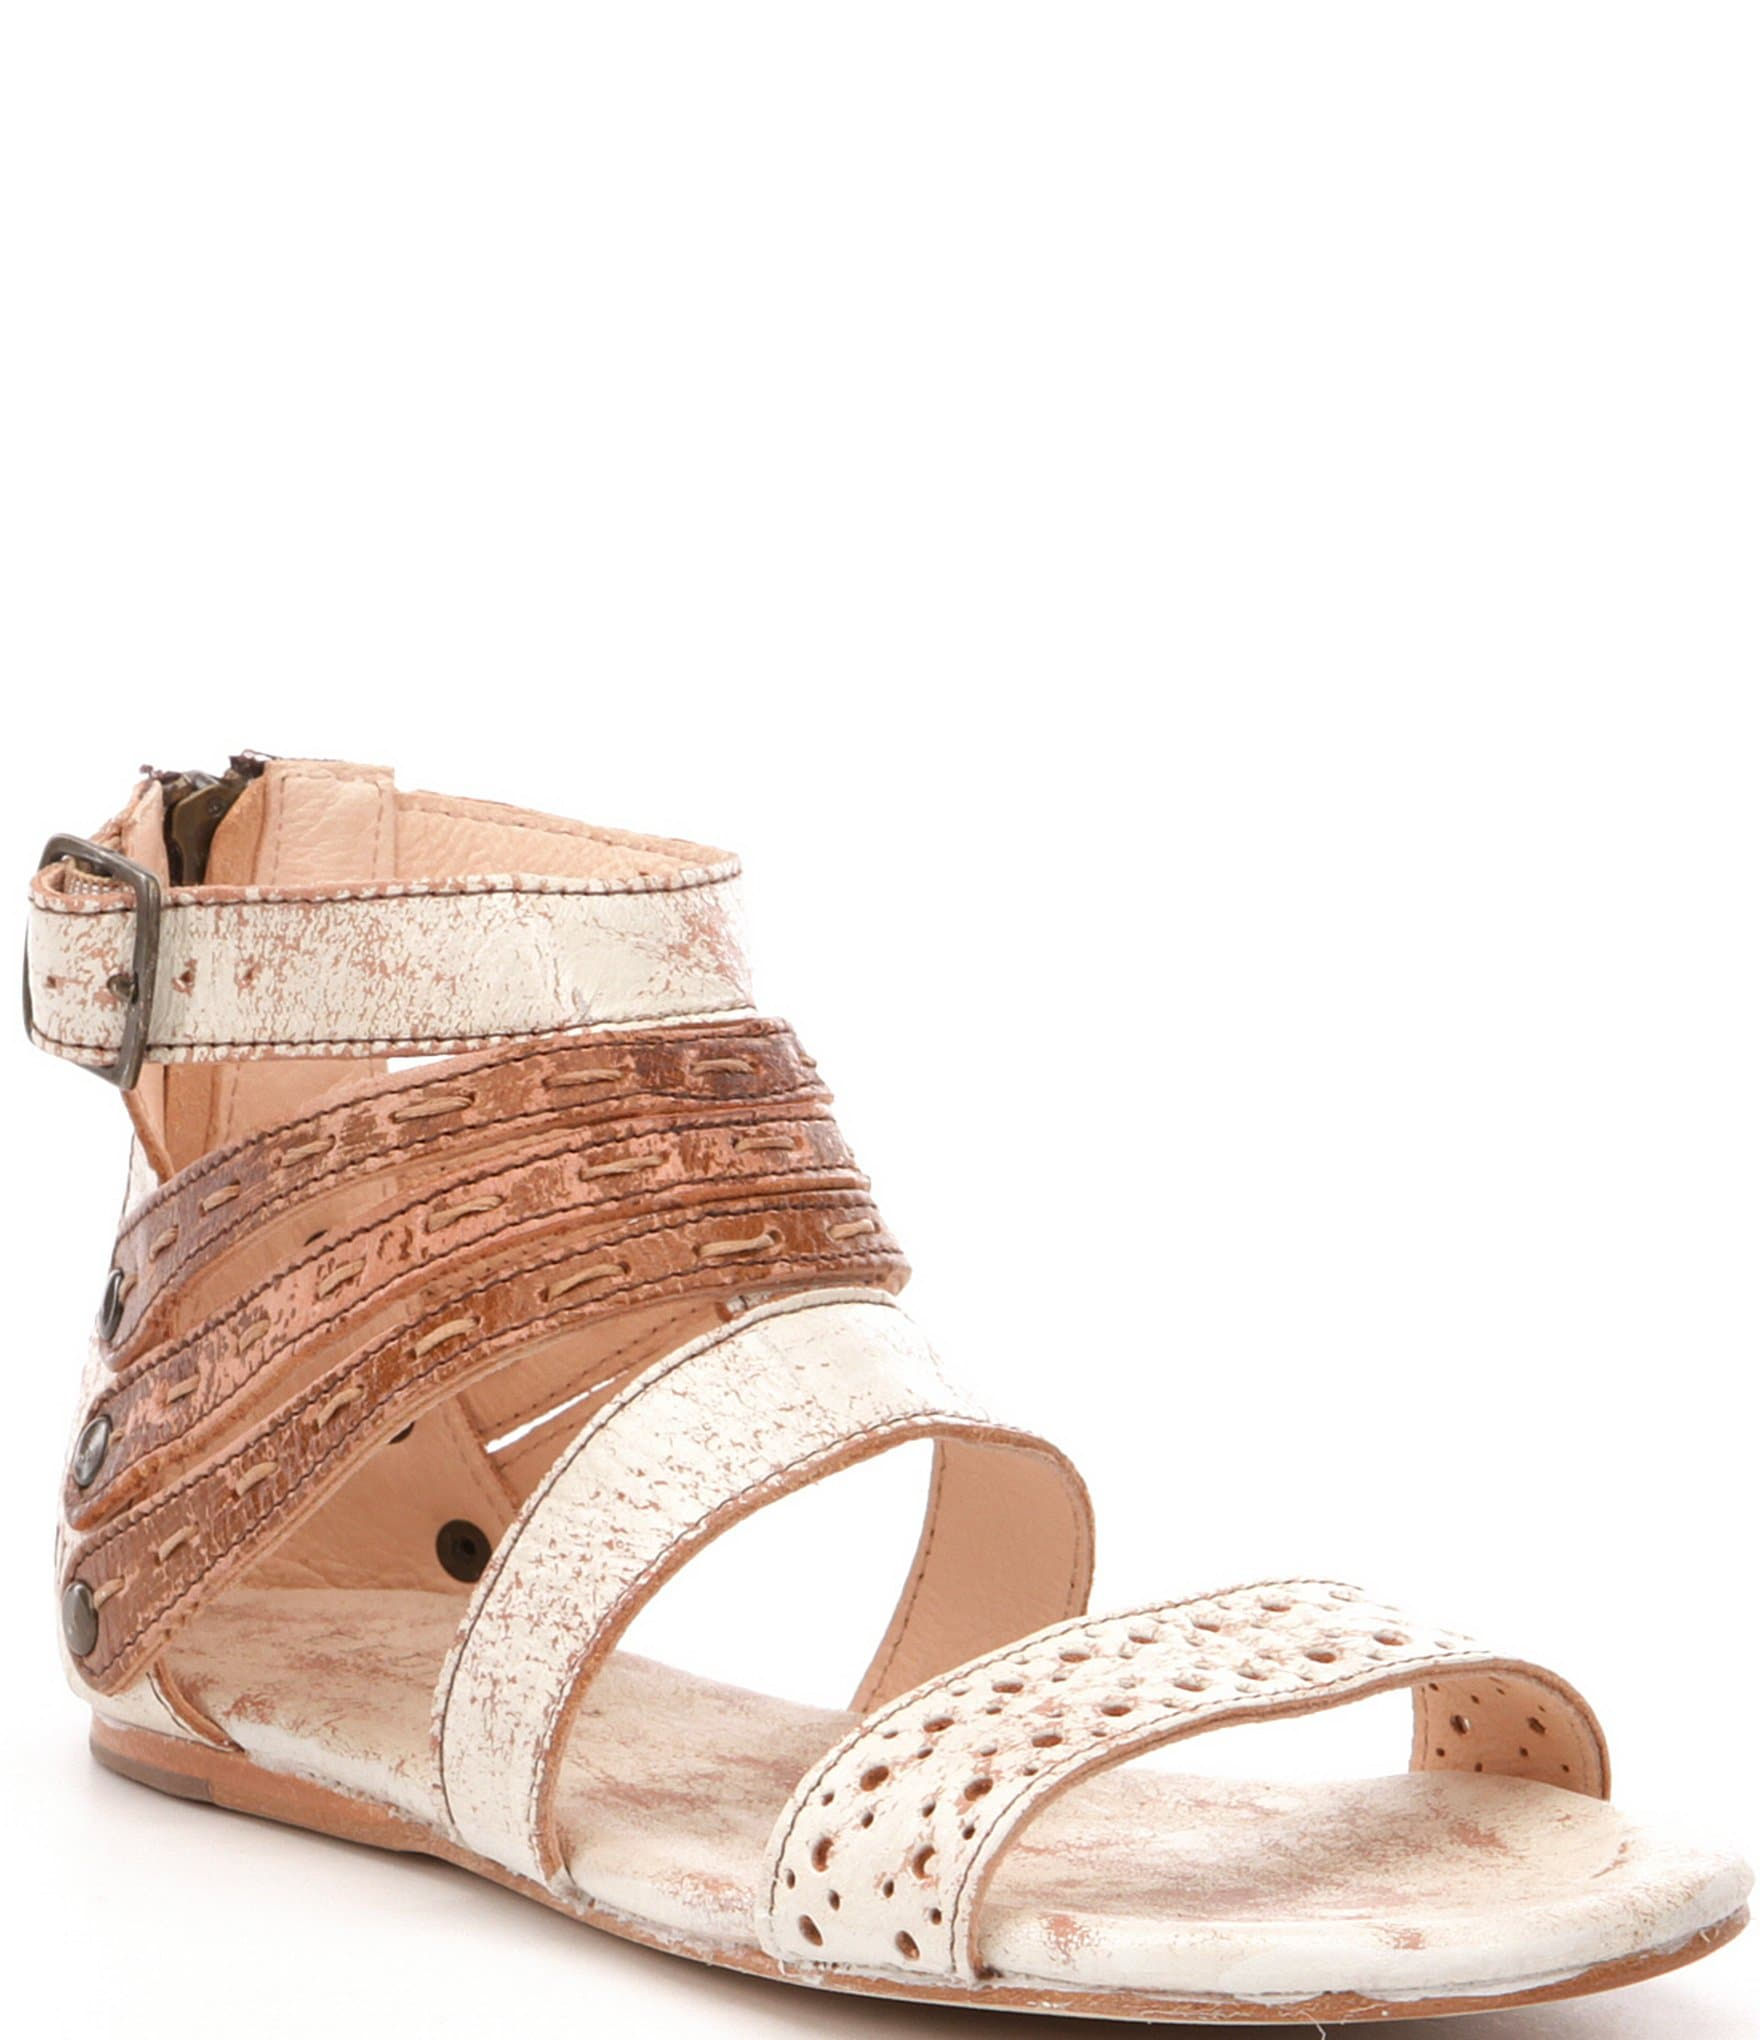 Ensley Multi-Strap Slingback Detail Sandals luvcco